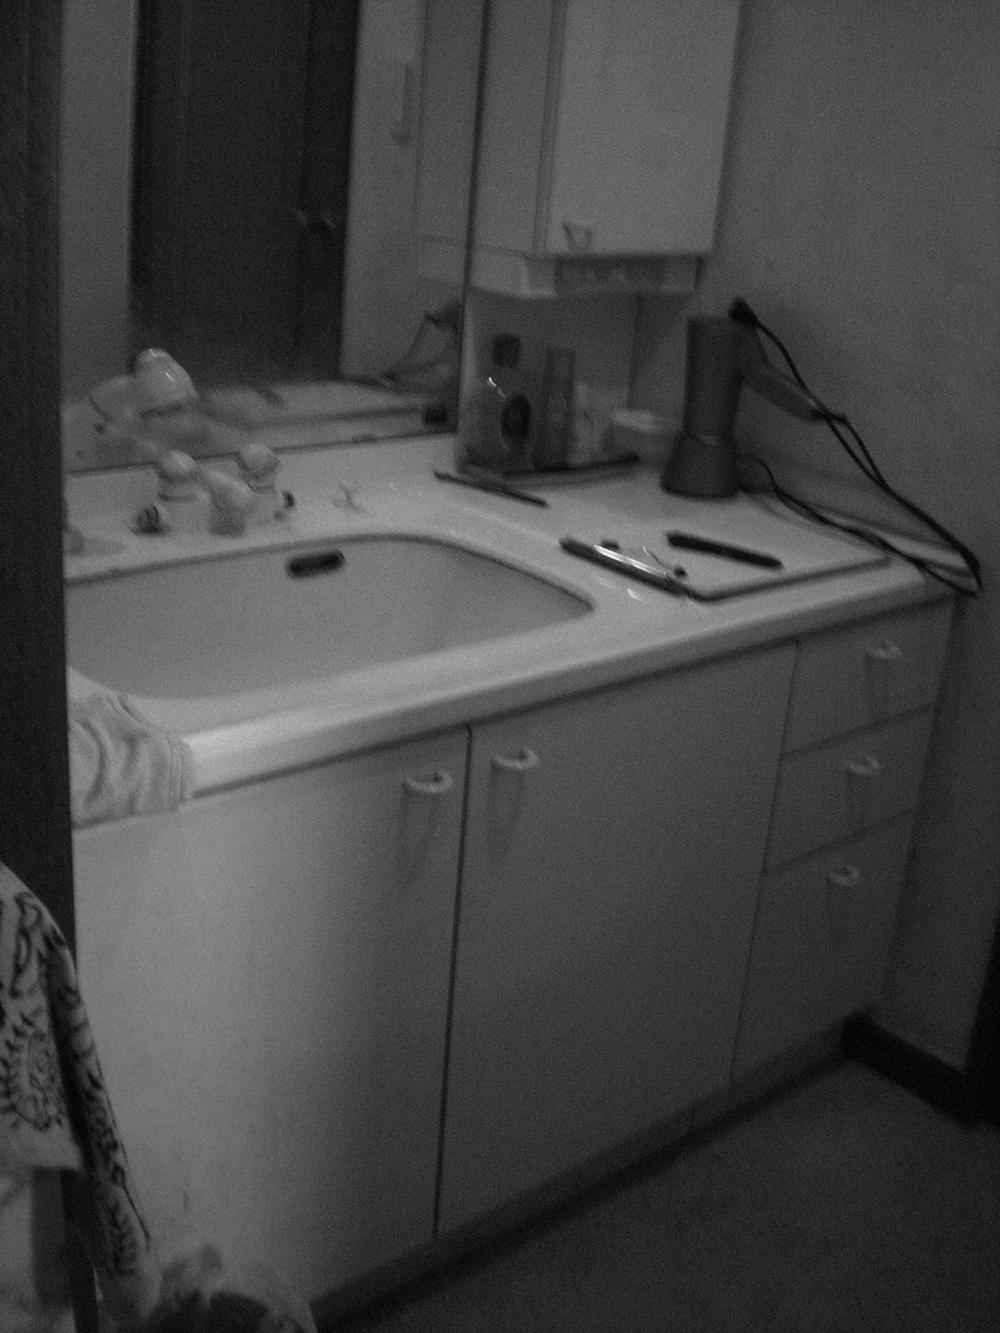 青葉区S邸 洗面化粧台リフォーム 29.7万円※内装工事含/工期1日間 施工前